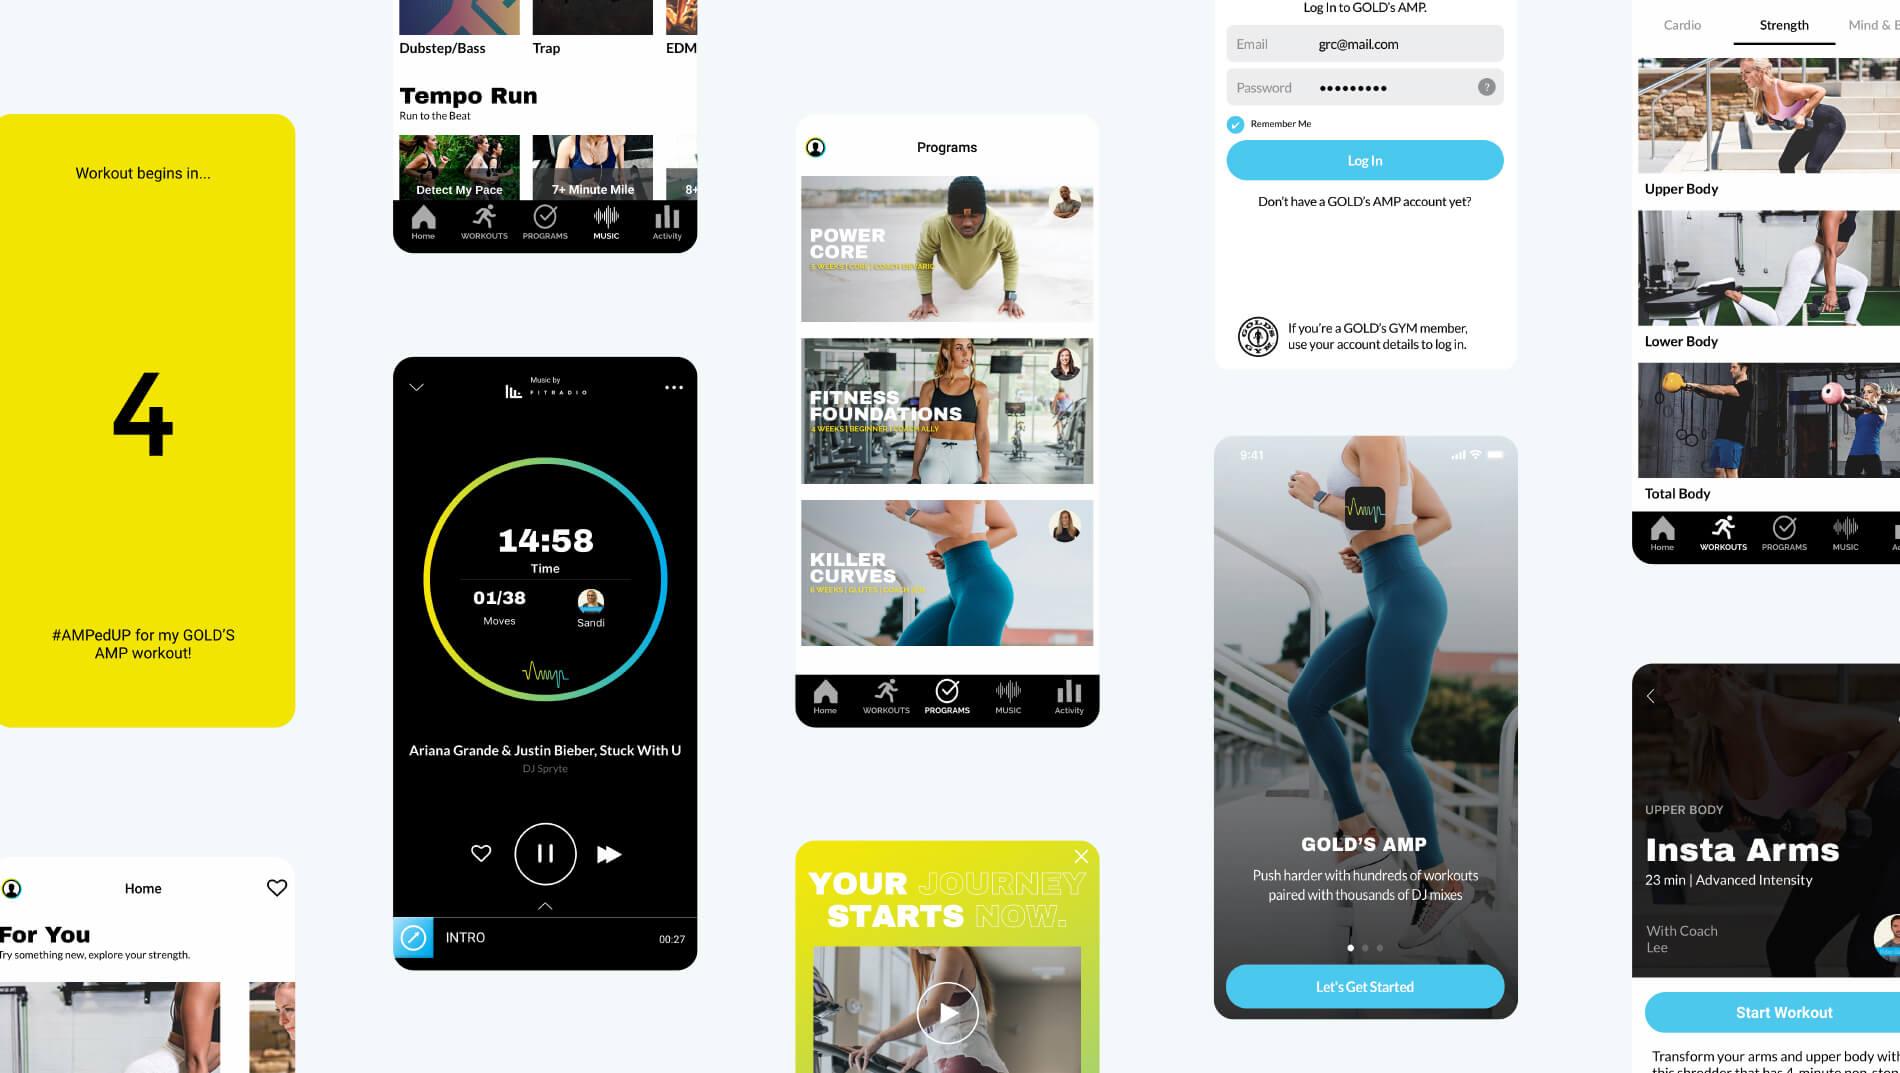 Gold's AMP app screens designs